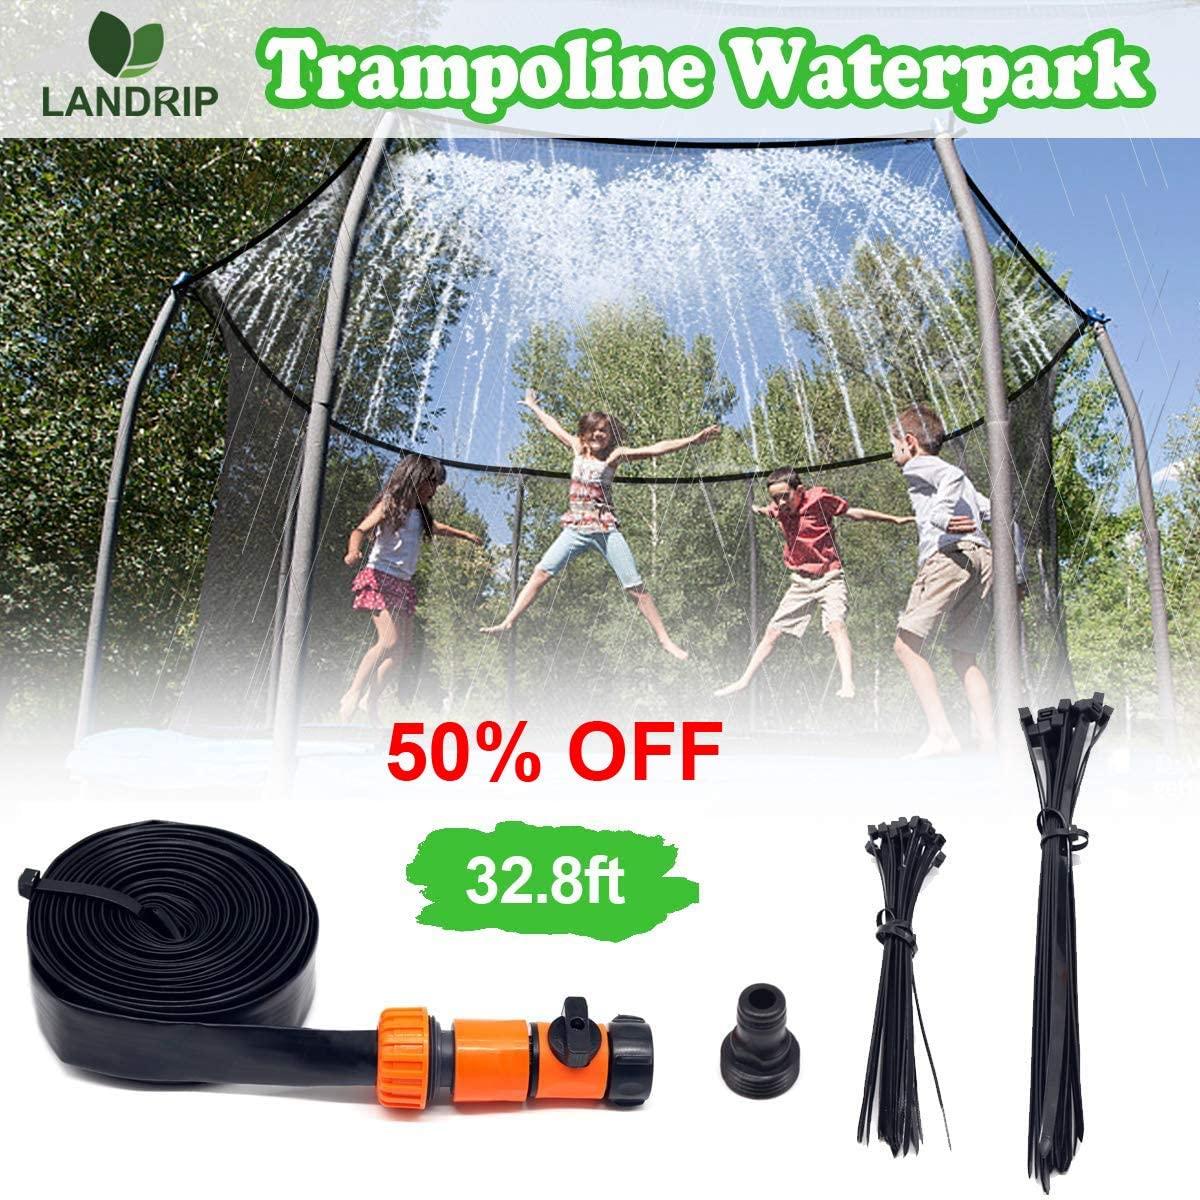 Landrip Trampoline Sprinkler,Trampoline Spray Water Park Fun Summer Outdoor Kids Water Sprinkler Game Toys Trampoline Accessories(32.8 Feet)